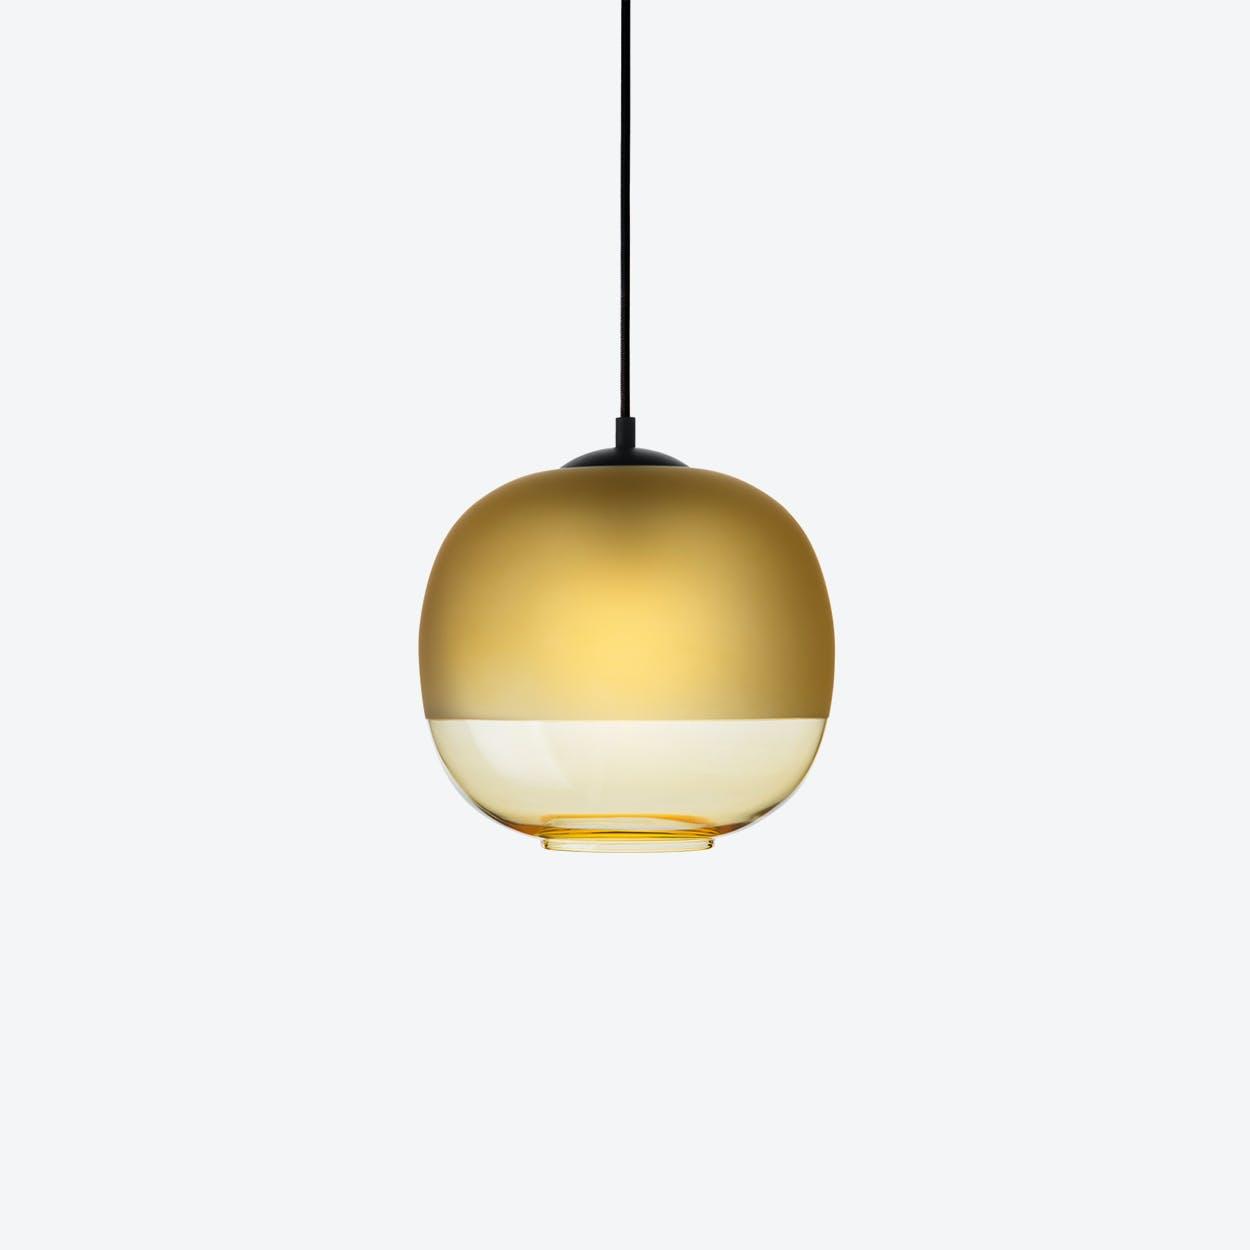 Bale Pendant Lamp in Amber